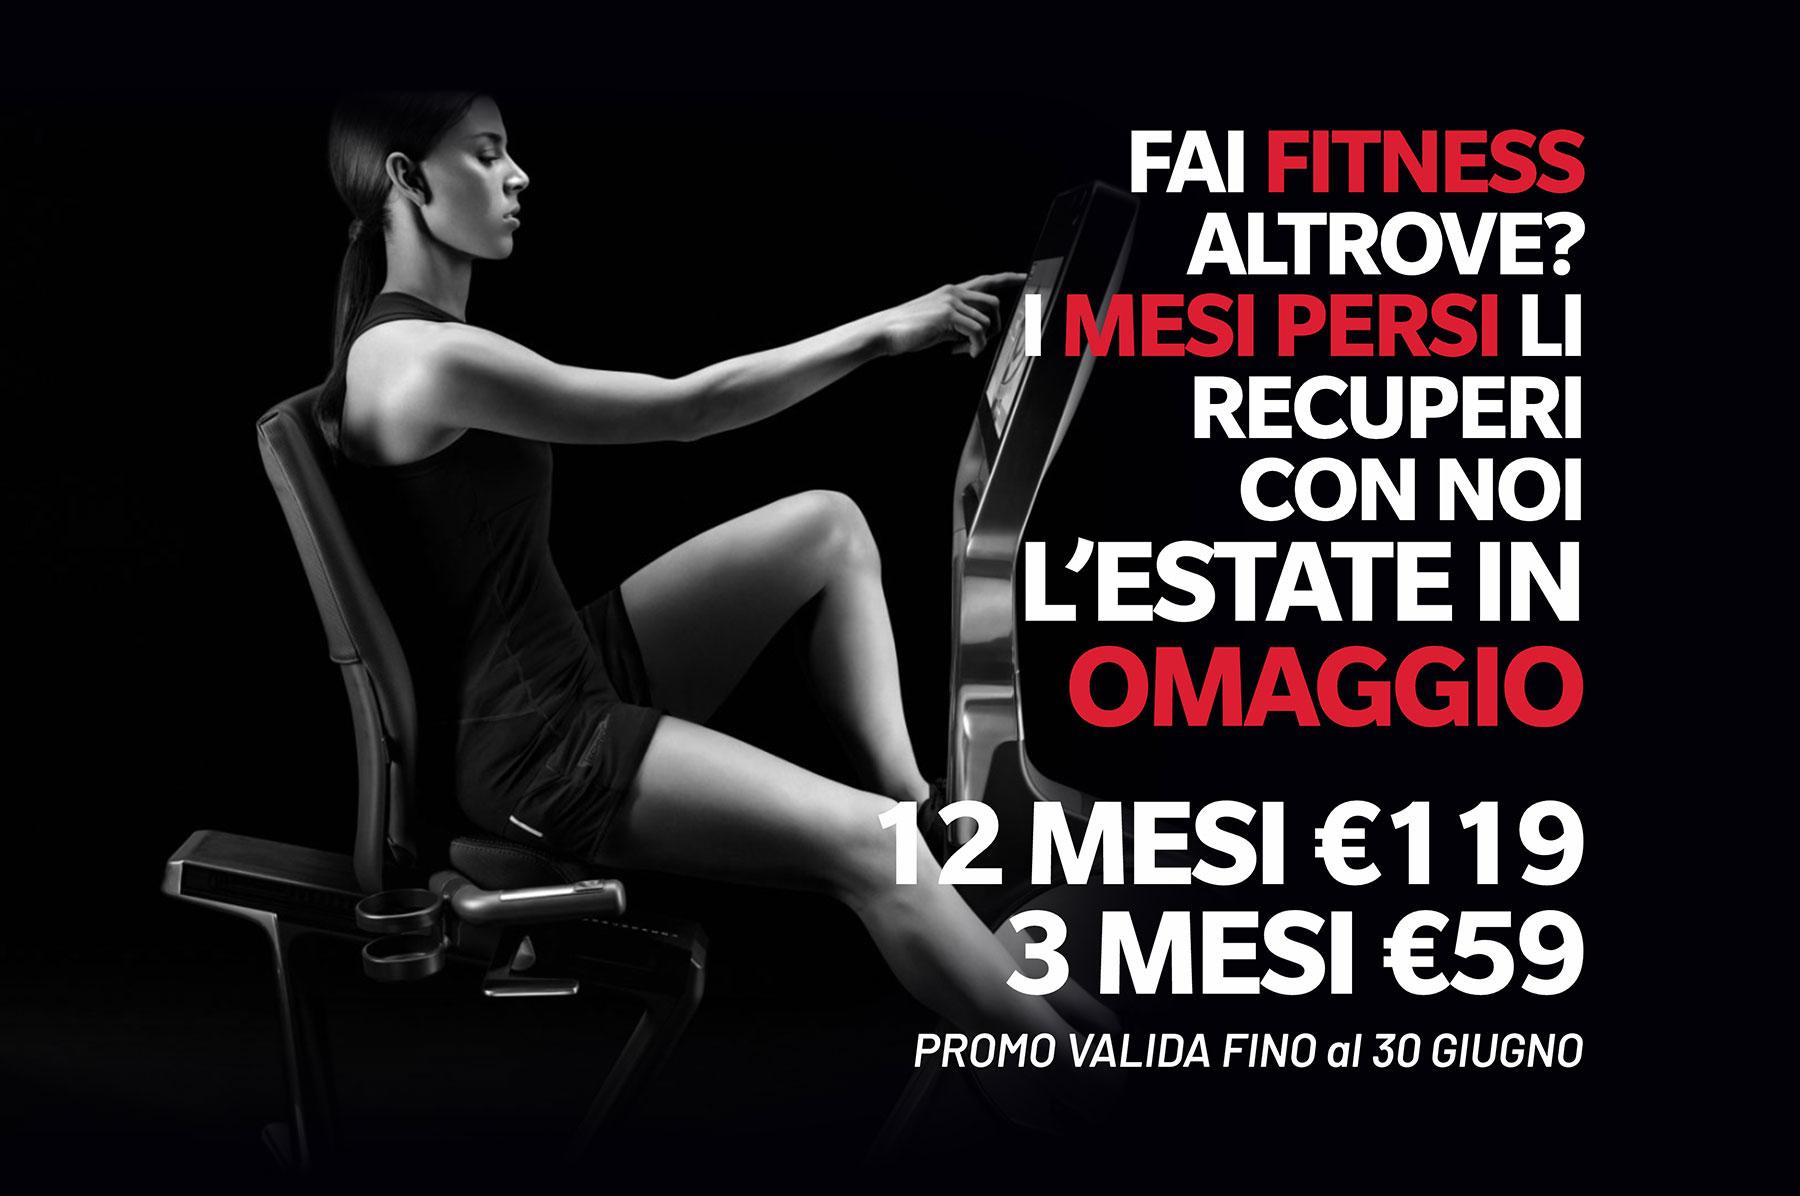 extra-fitnes-promo-giugno-2021